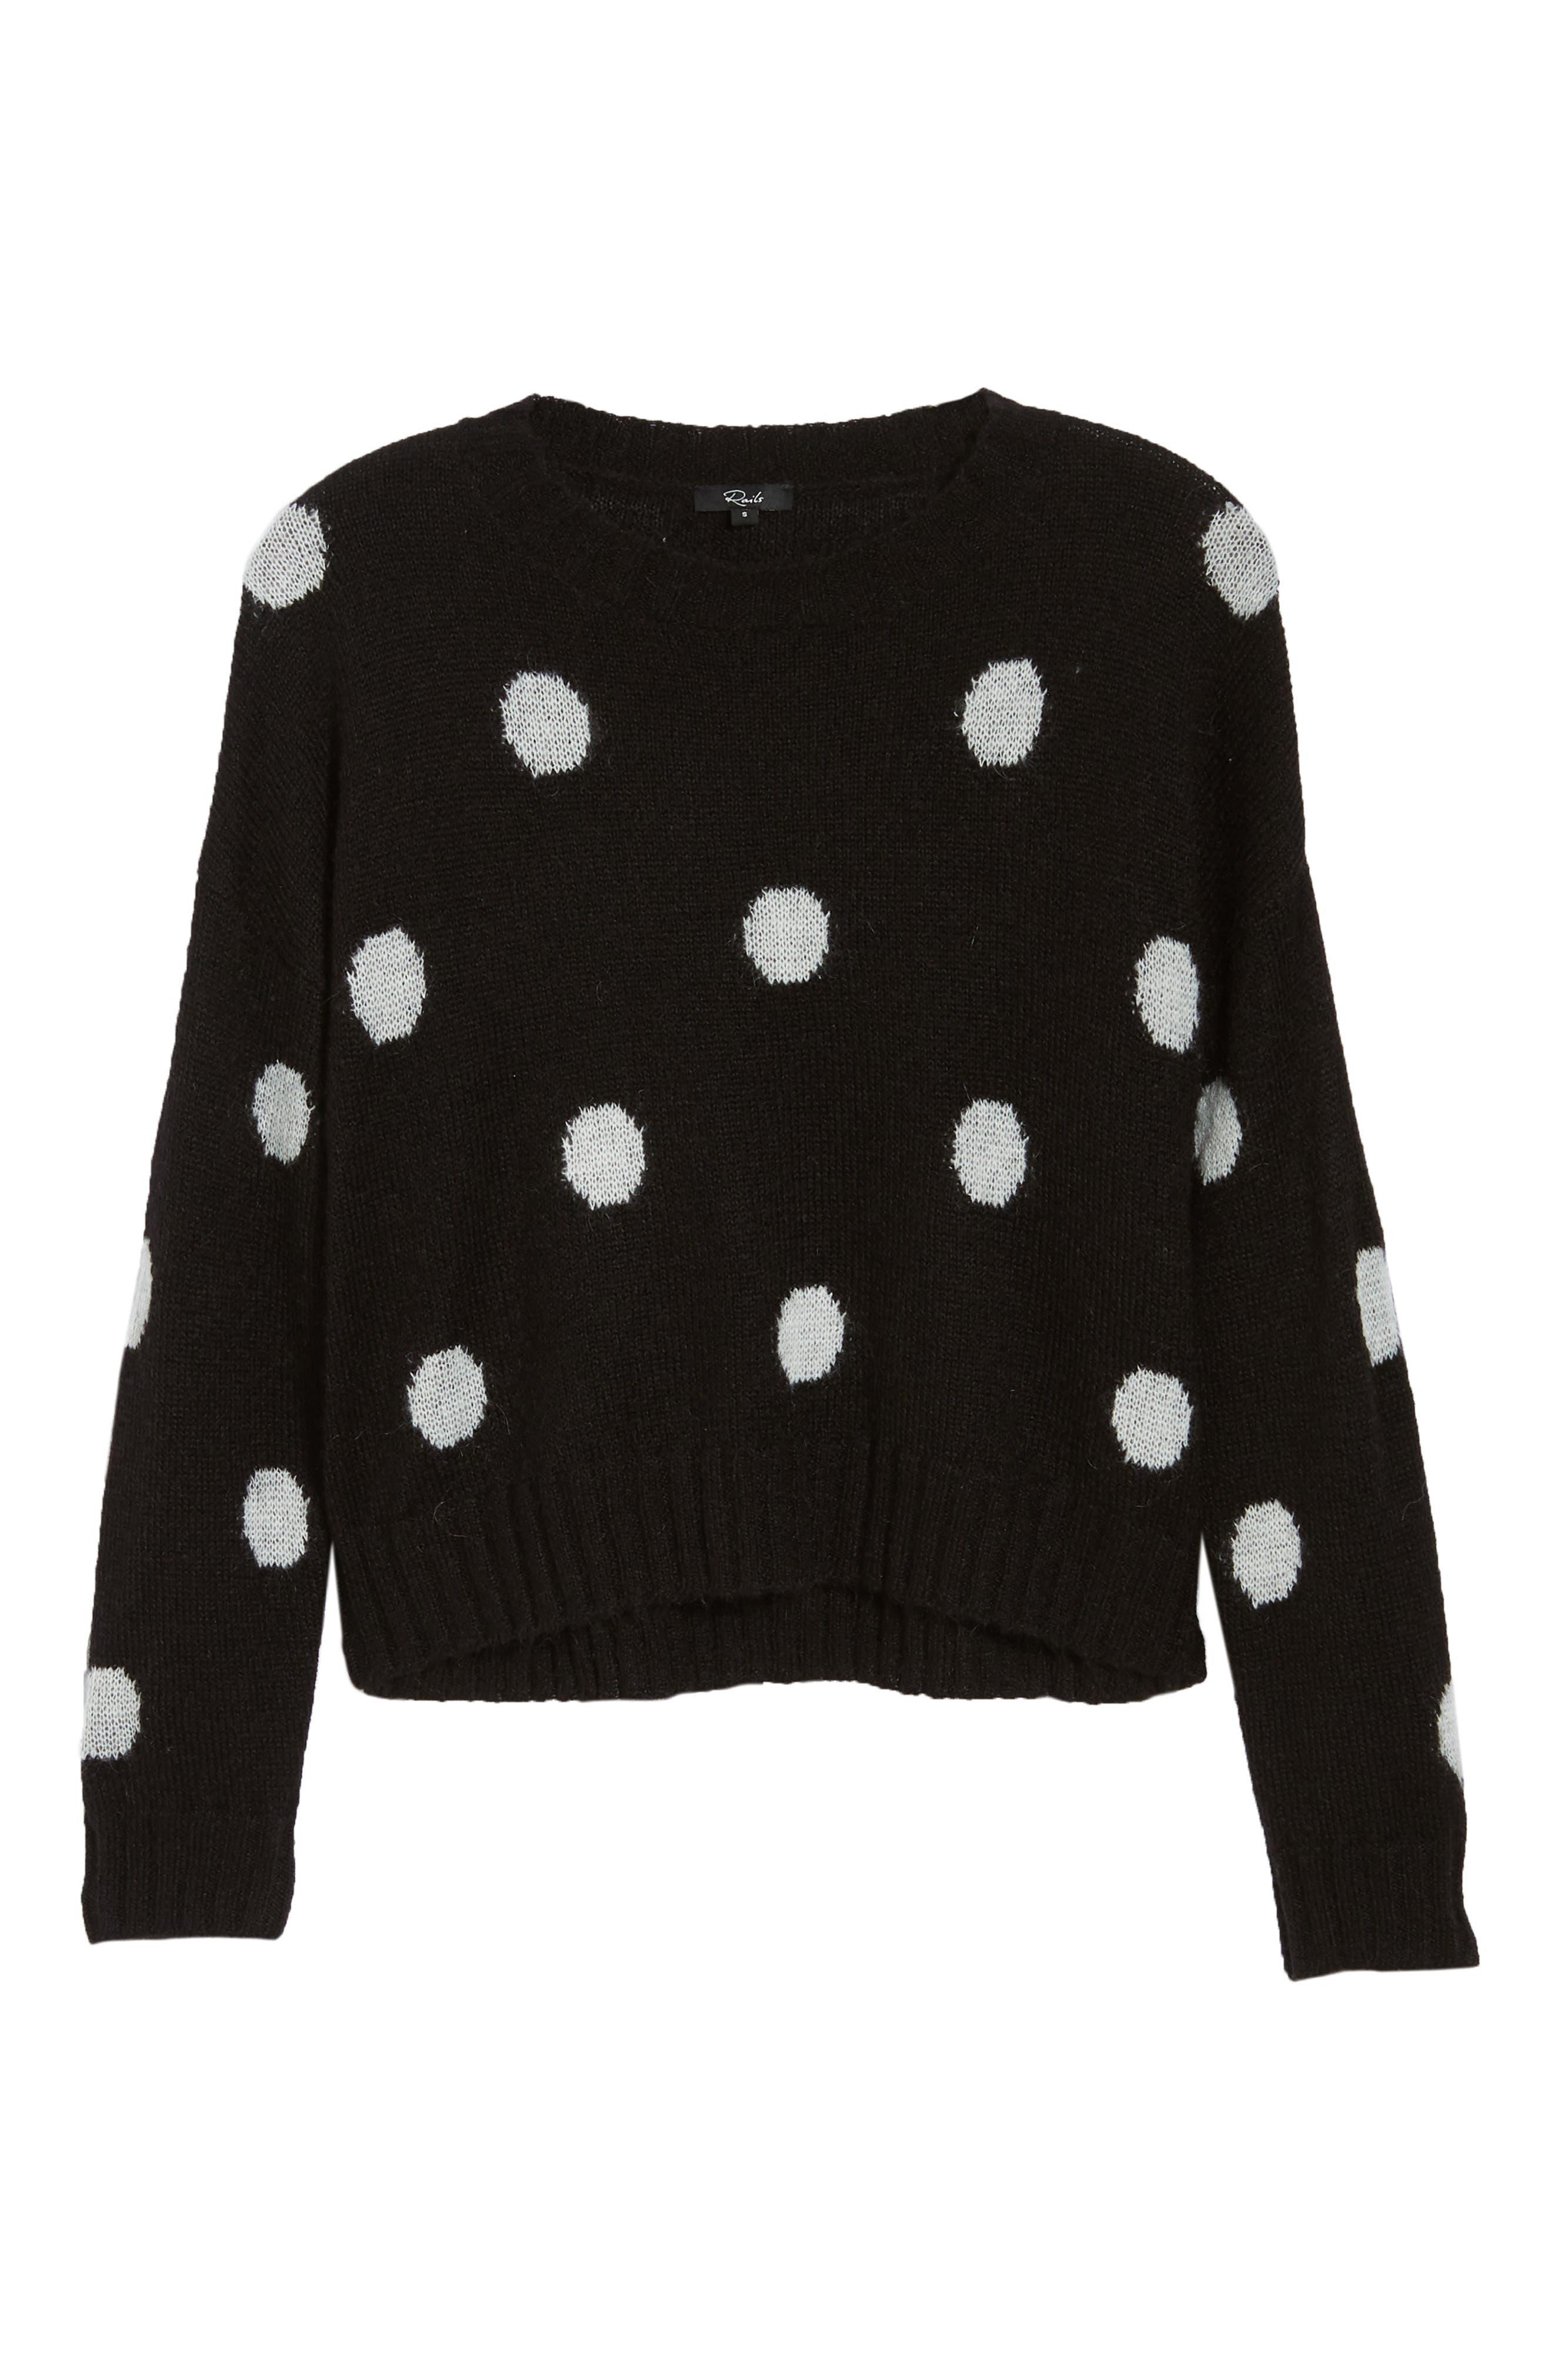 Perci Sweater,                             Alternate thumbnail 6, color,                             BLACK/ IVORY POLKA DOT